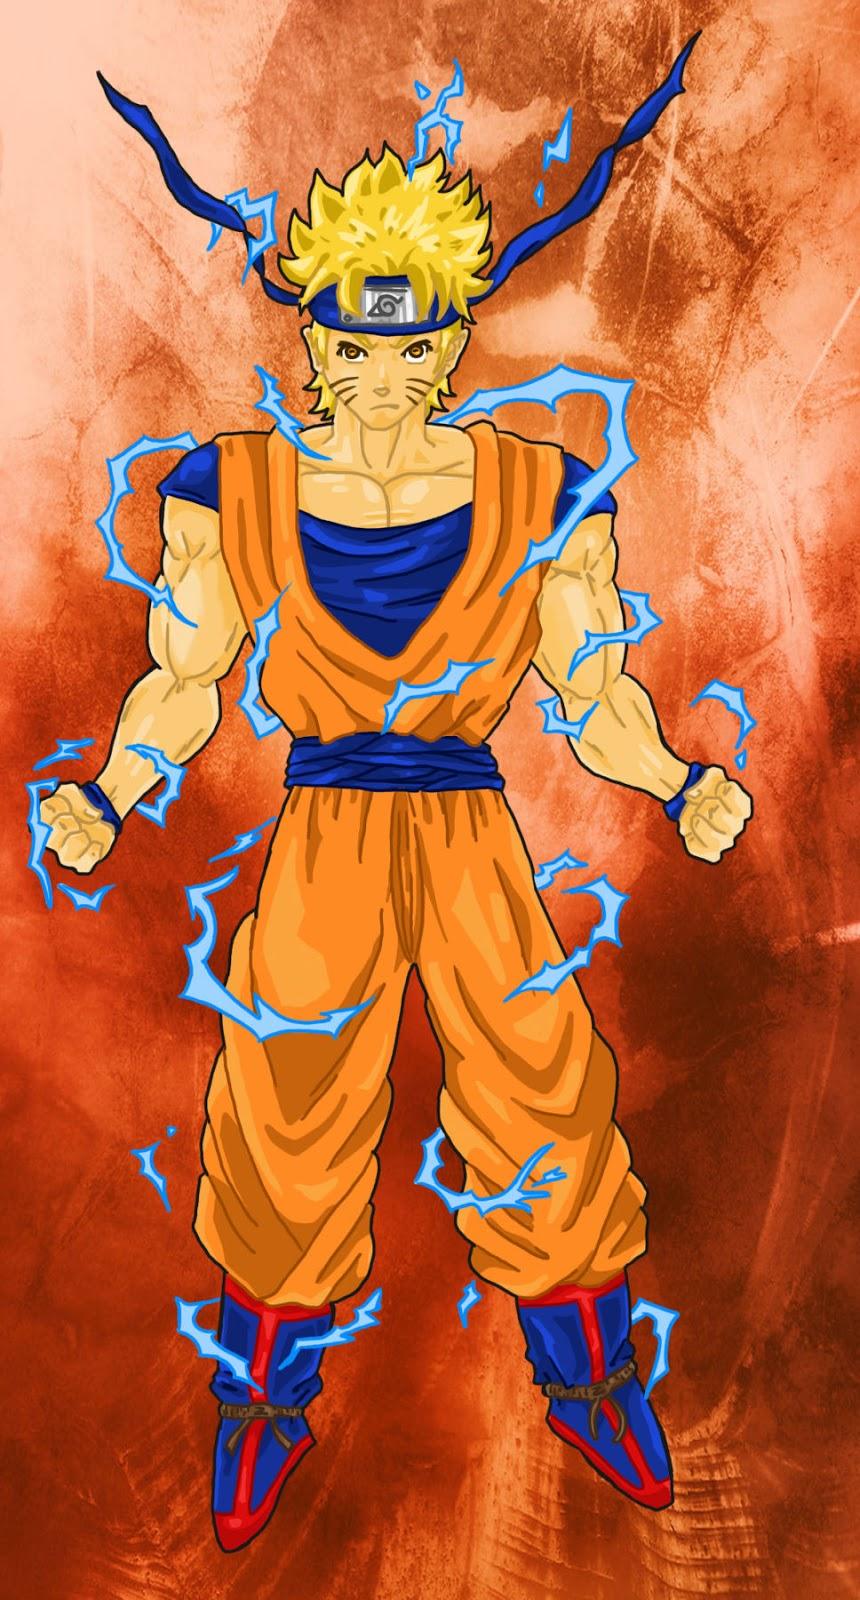 Naruto super saiyan by kamikage86 on deviantart - Dessin naruto en couleur ...